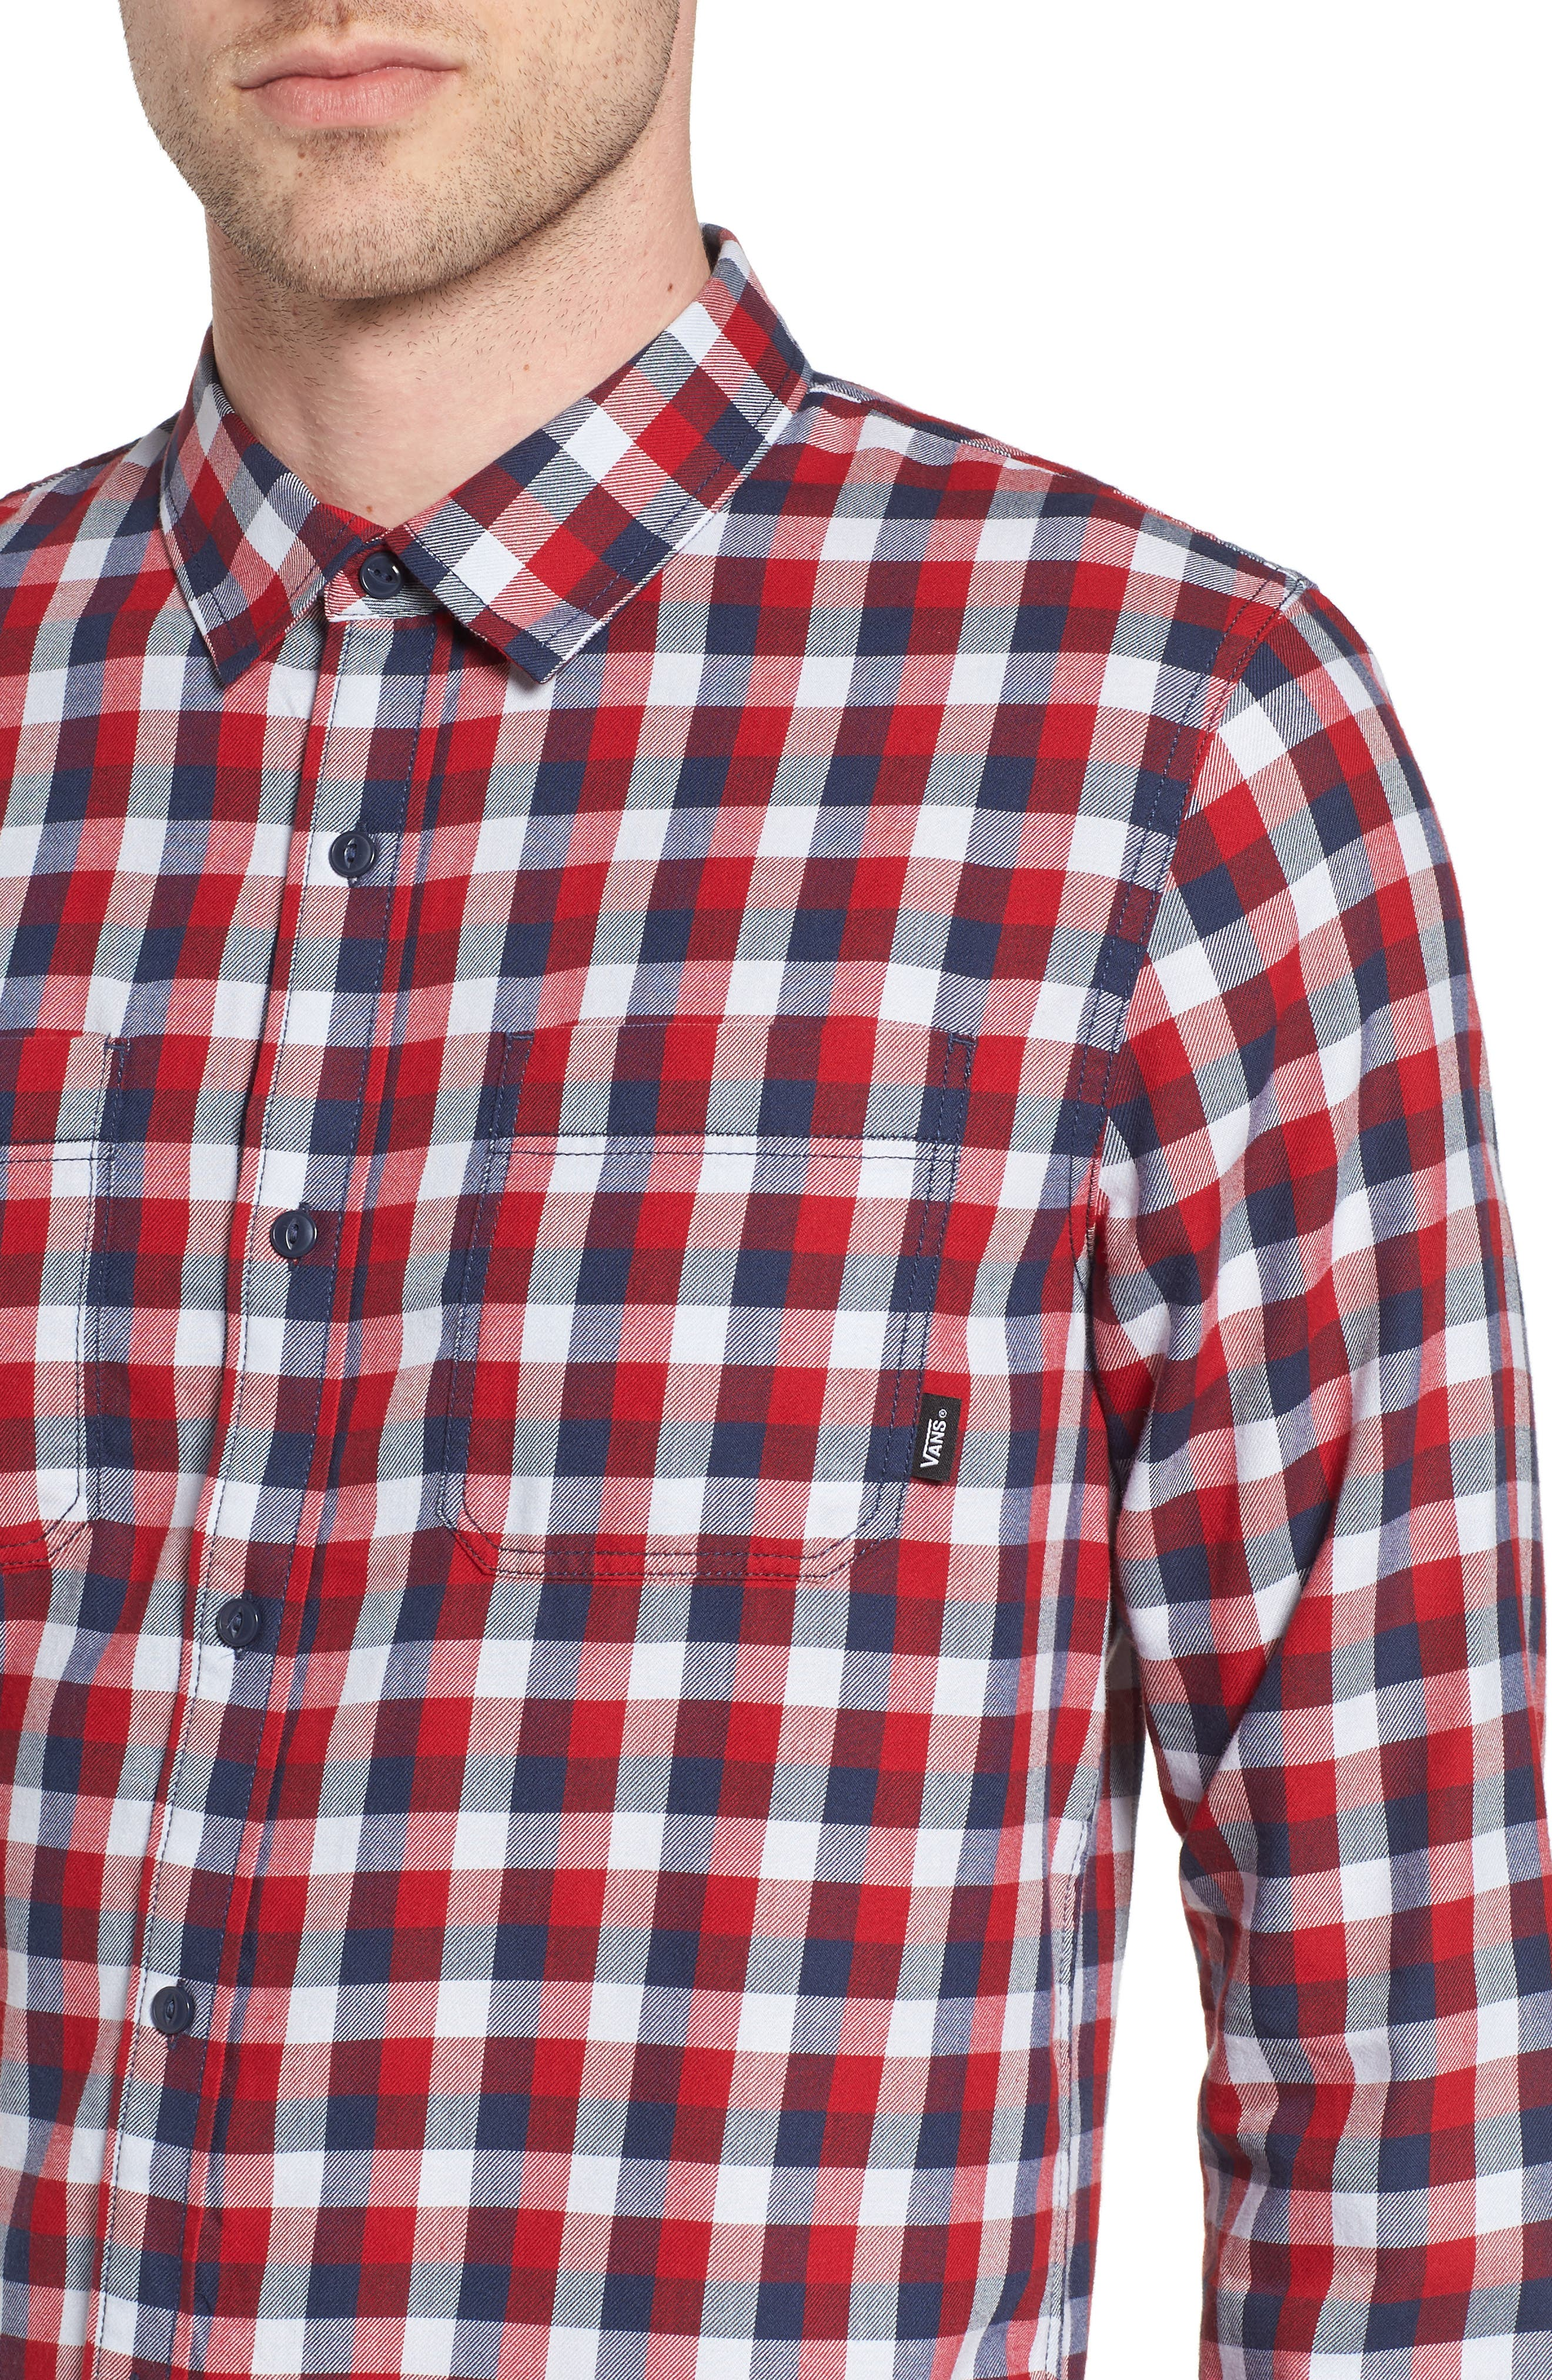 Alternate Image 4  - Vans Alameda II Plaid Flannel Shirt